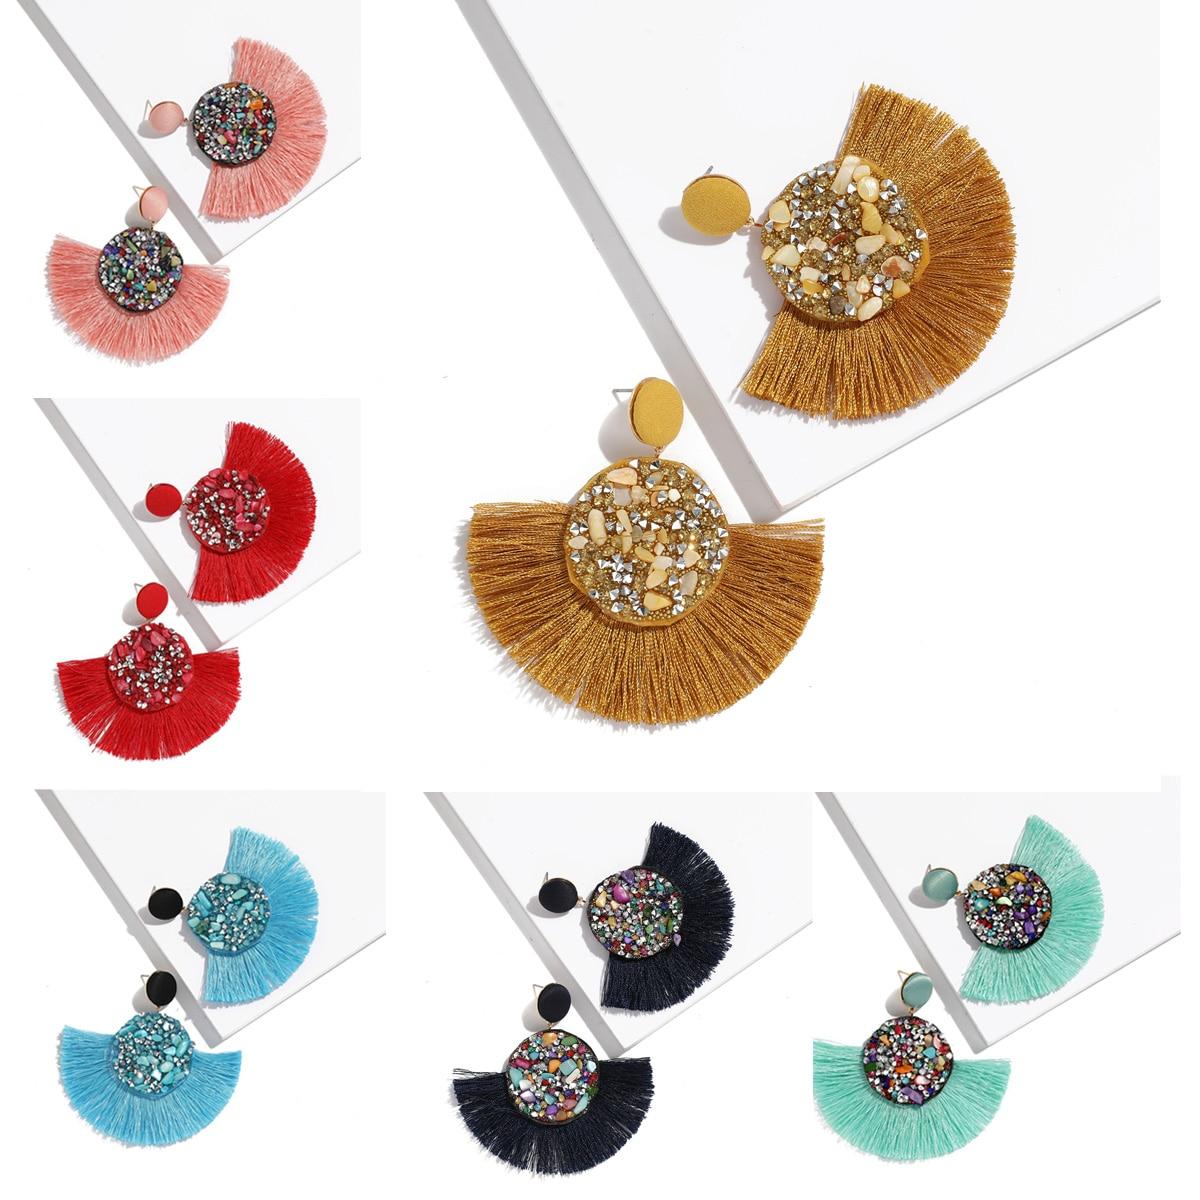 2019 Tassel Earrings Bohemian Colors Crystal Stone Statement Luxury Dangle Earrings Geometric Fringe Pendientes Oorbellen Women